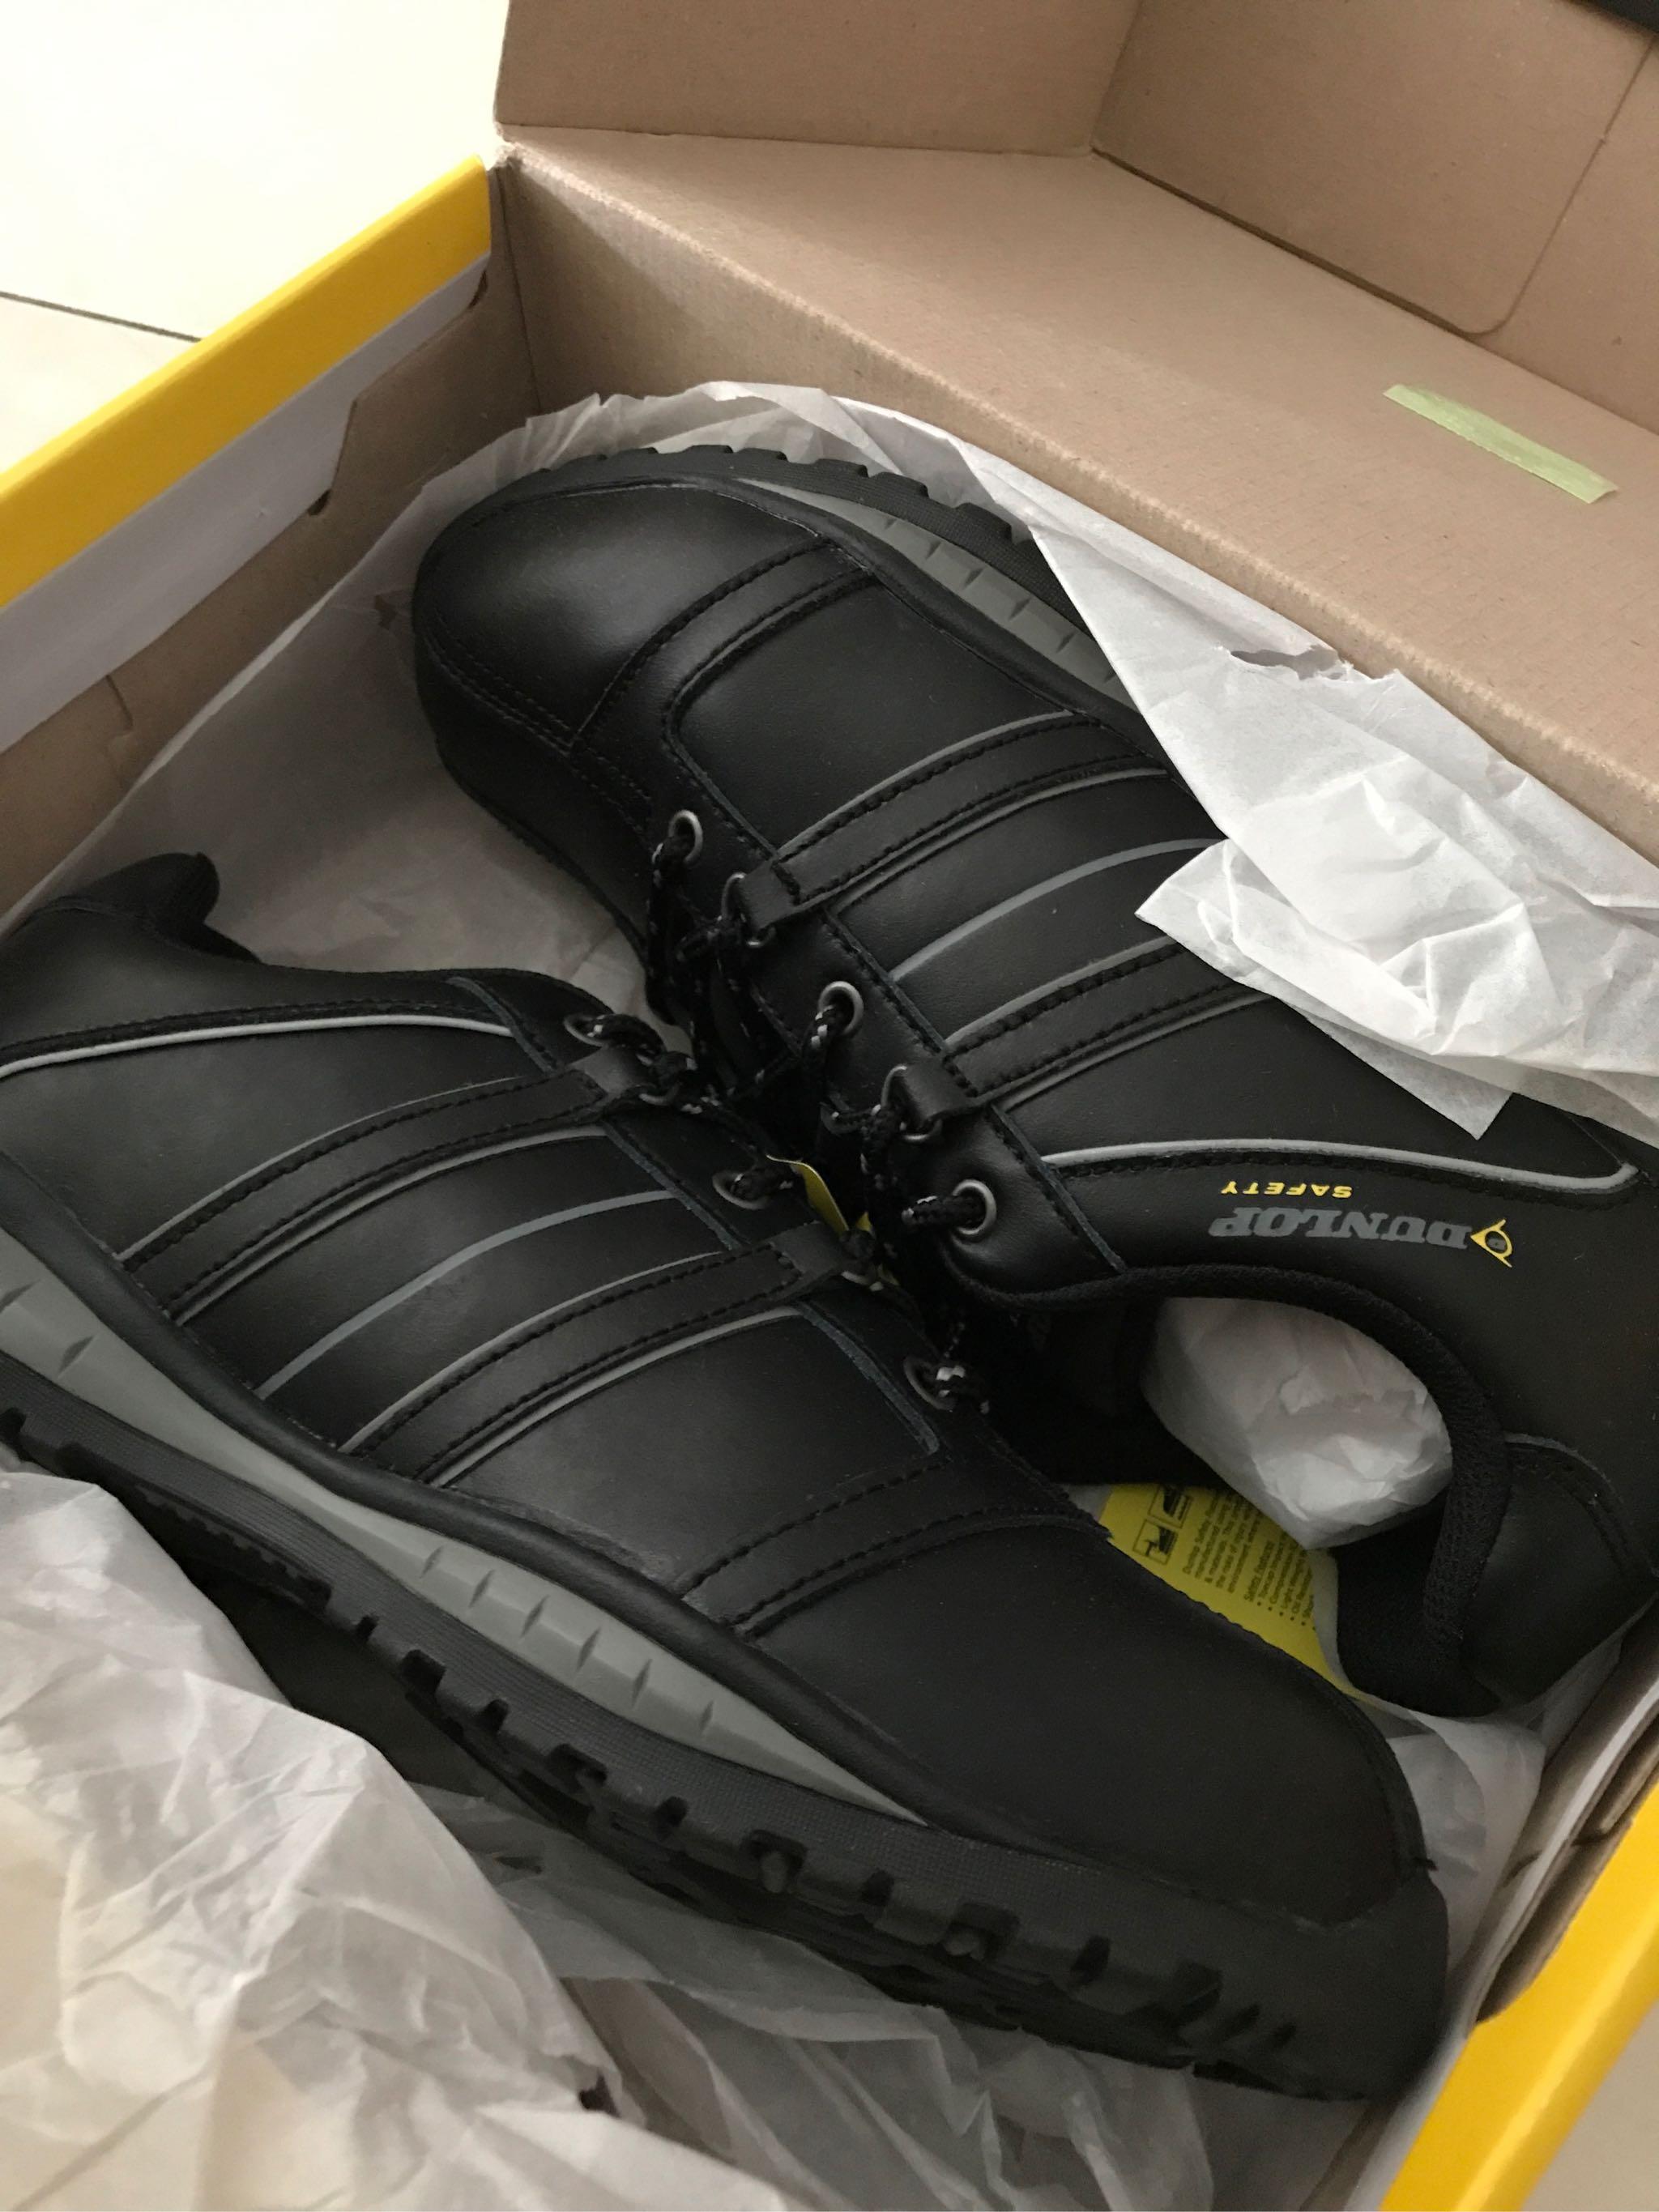 Dunlop Mens Idaho Safety Shoes (Black